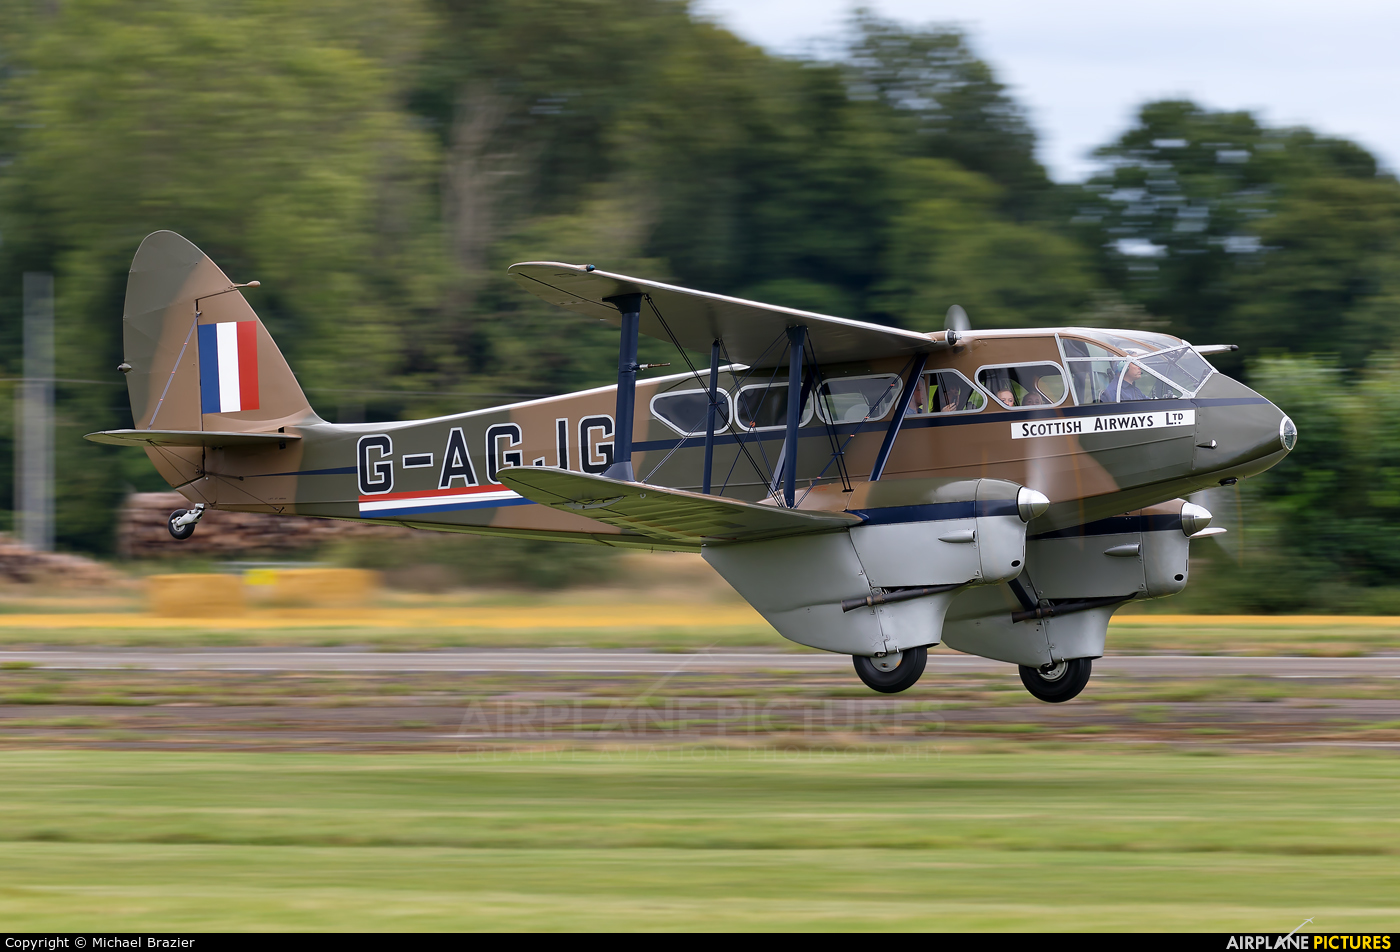 Private G-AGJG aircraft at Shobdon Airfield